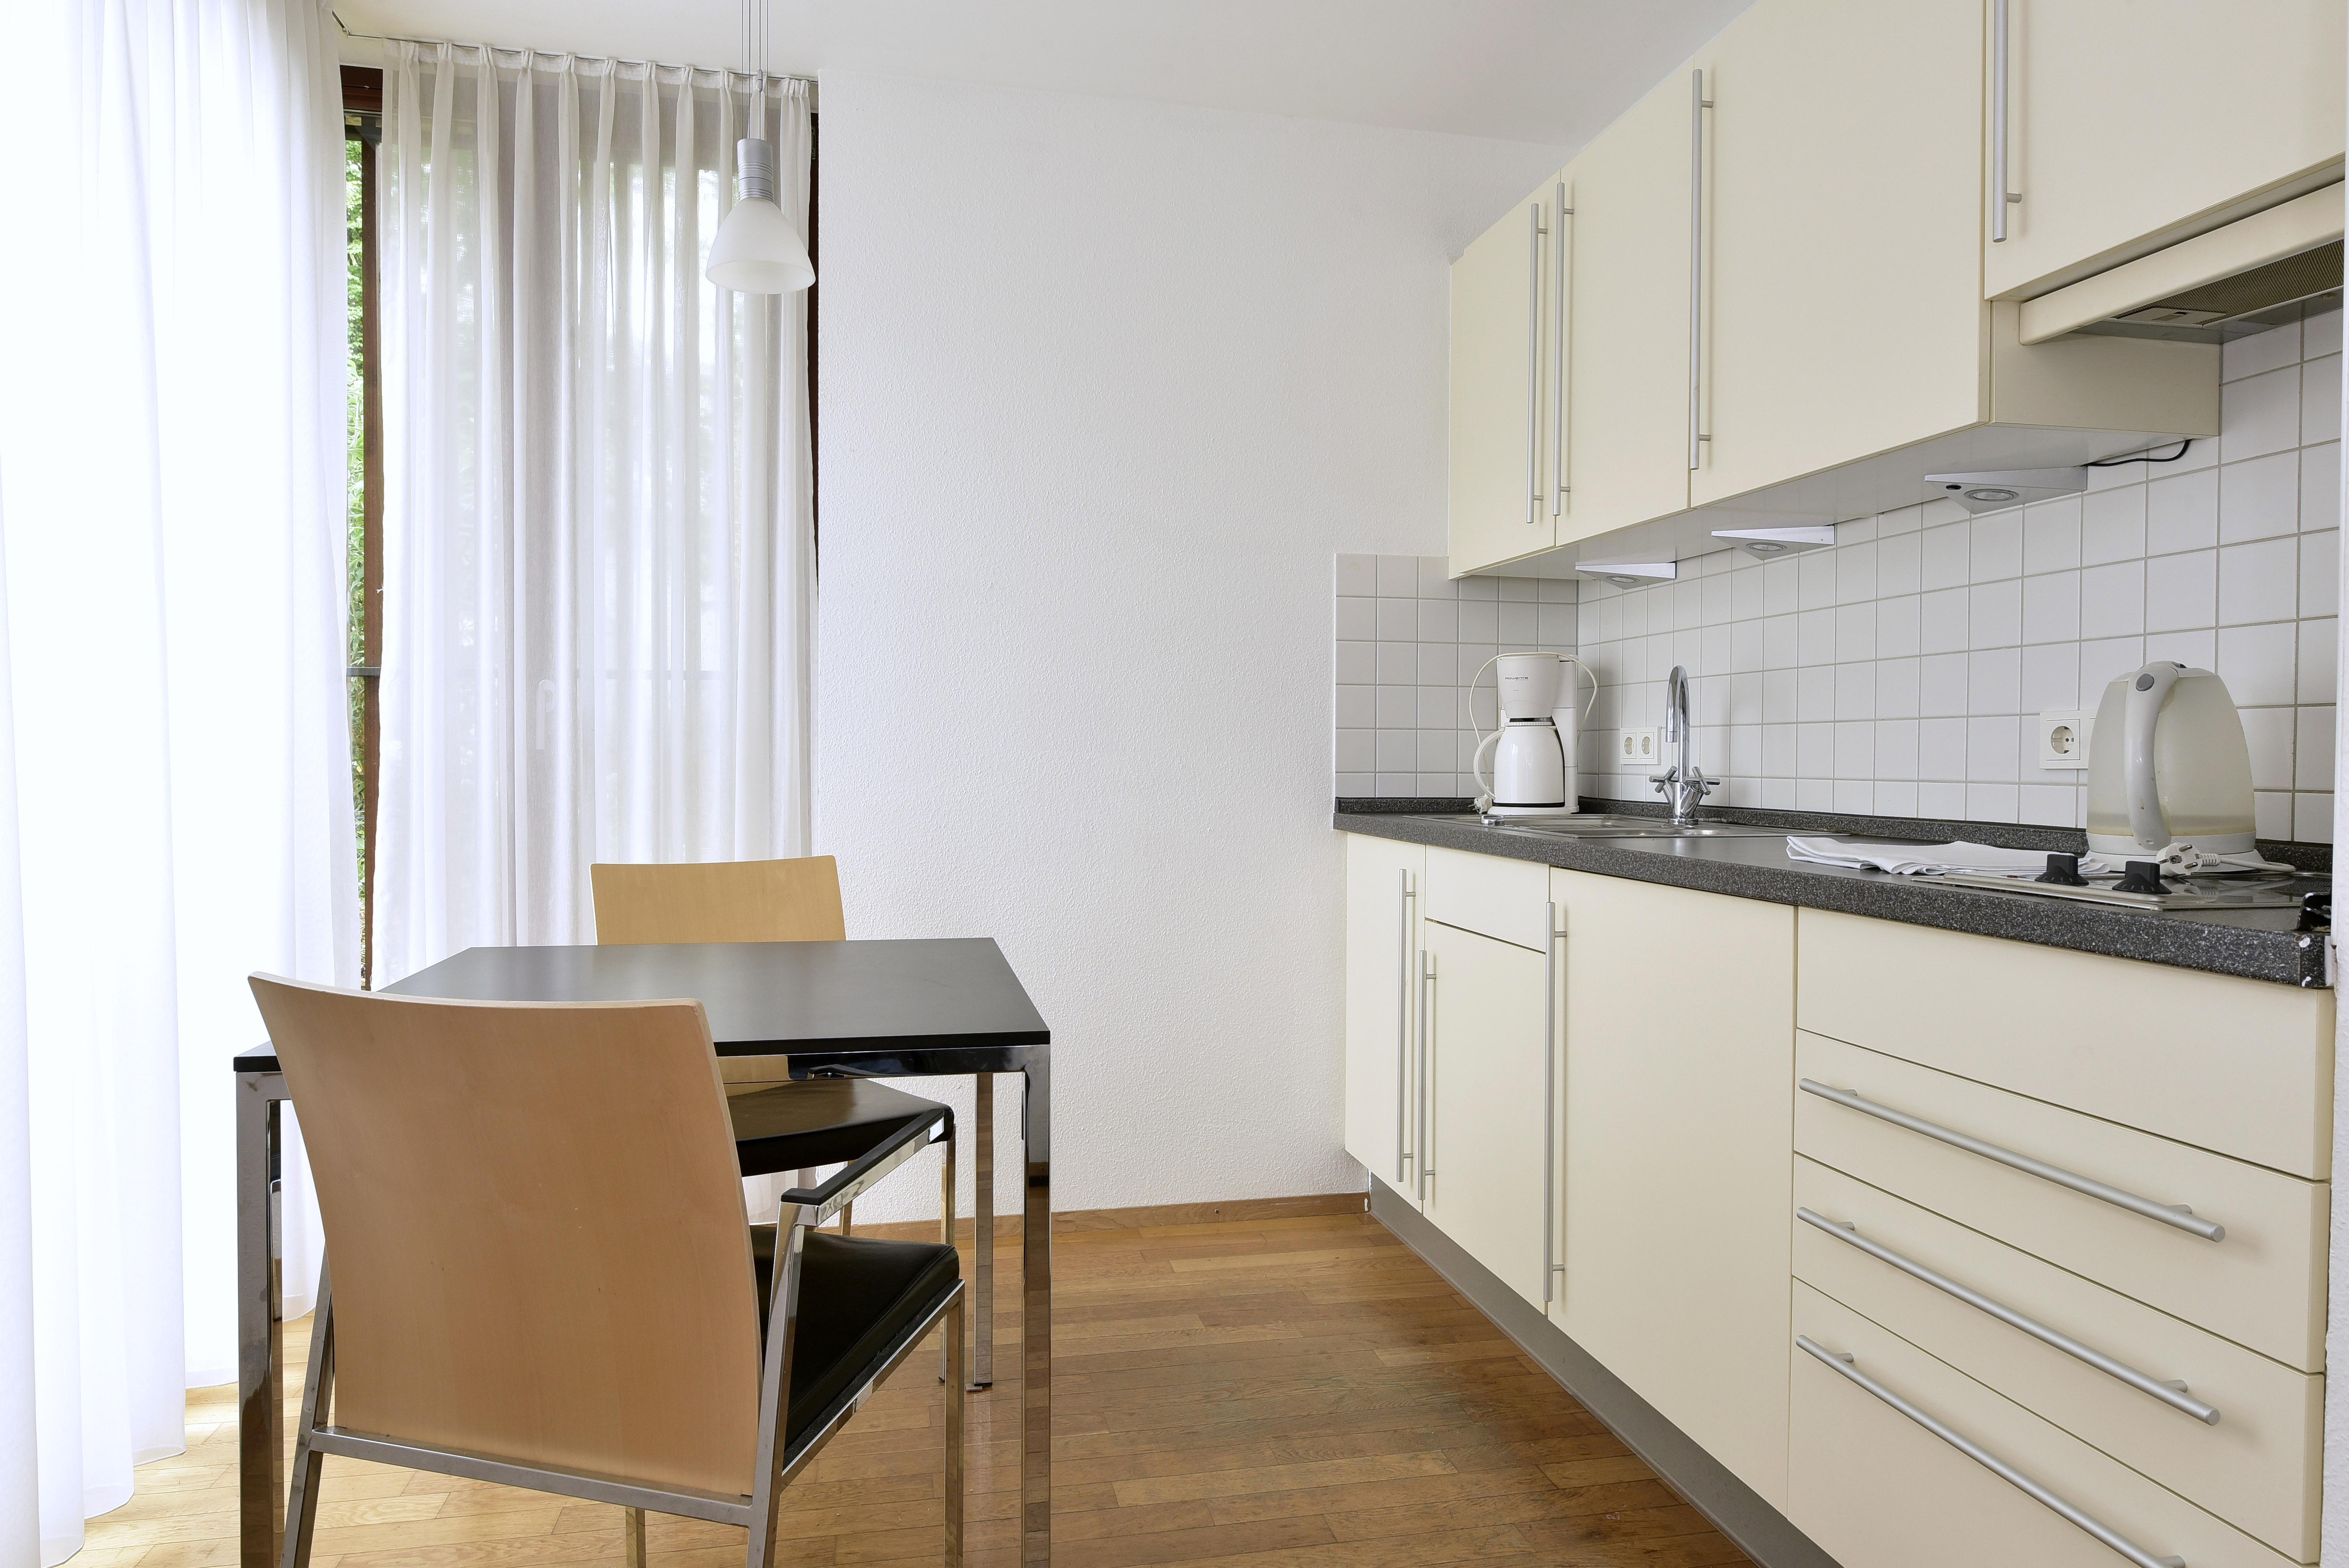 Liefmann-Haus Neubau — Housing